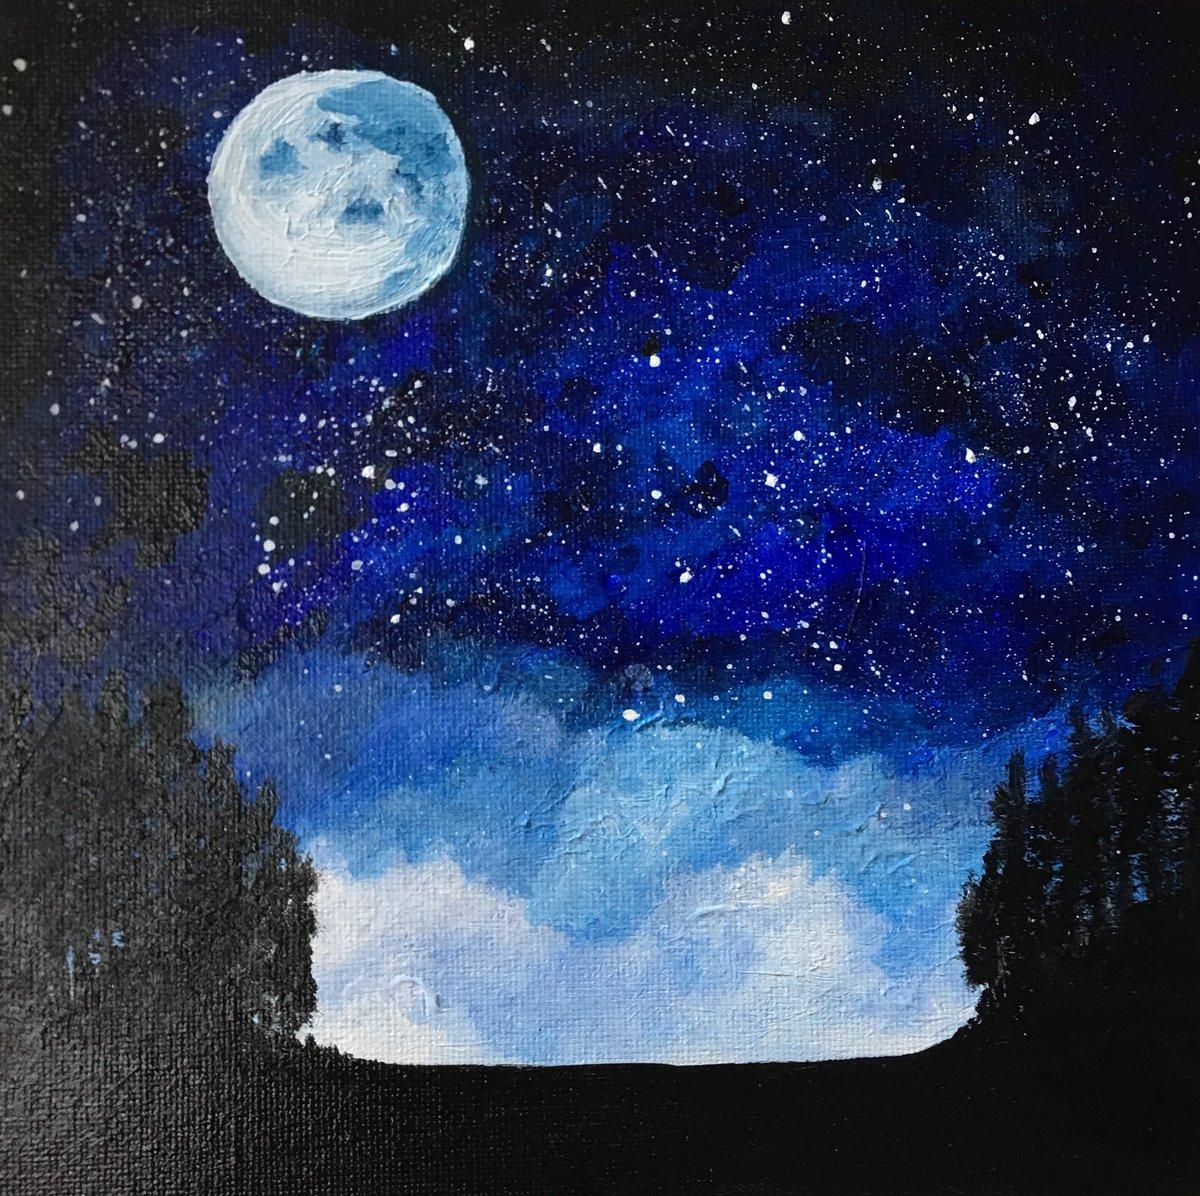 "Moonlight #HarshadaKhare #Acryliconcanvas, 20*20 cm, 8""x8"", 2019, You can #purchase #painting #online  #decorative #landscape #india #original #handmade #exquisiteart #singapore #art #bestoftheday #design #drawing #inspiration #artist #artwork #onlineshop"